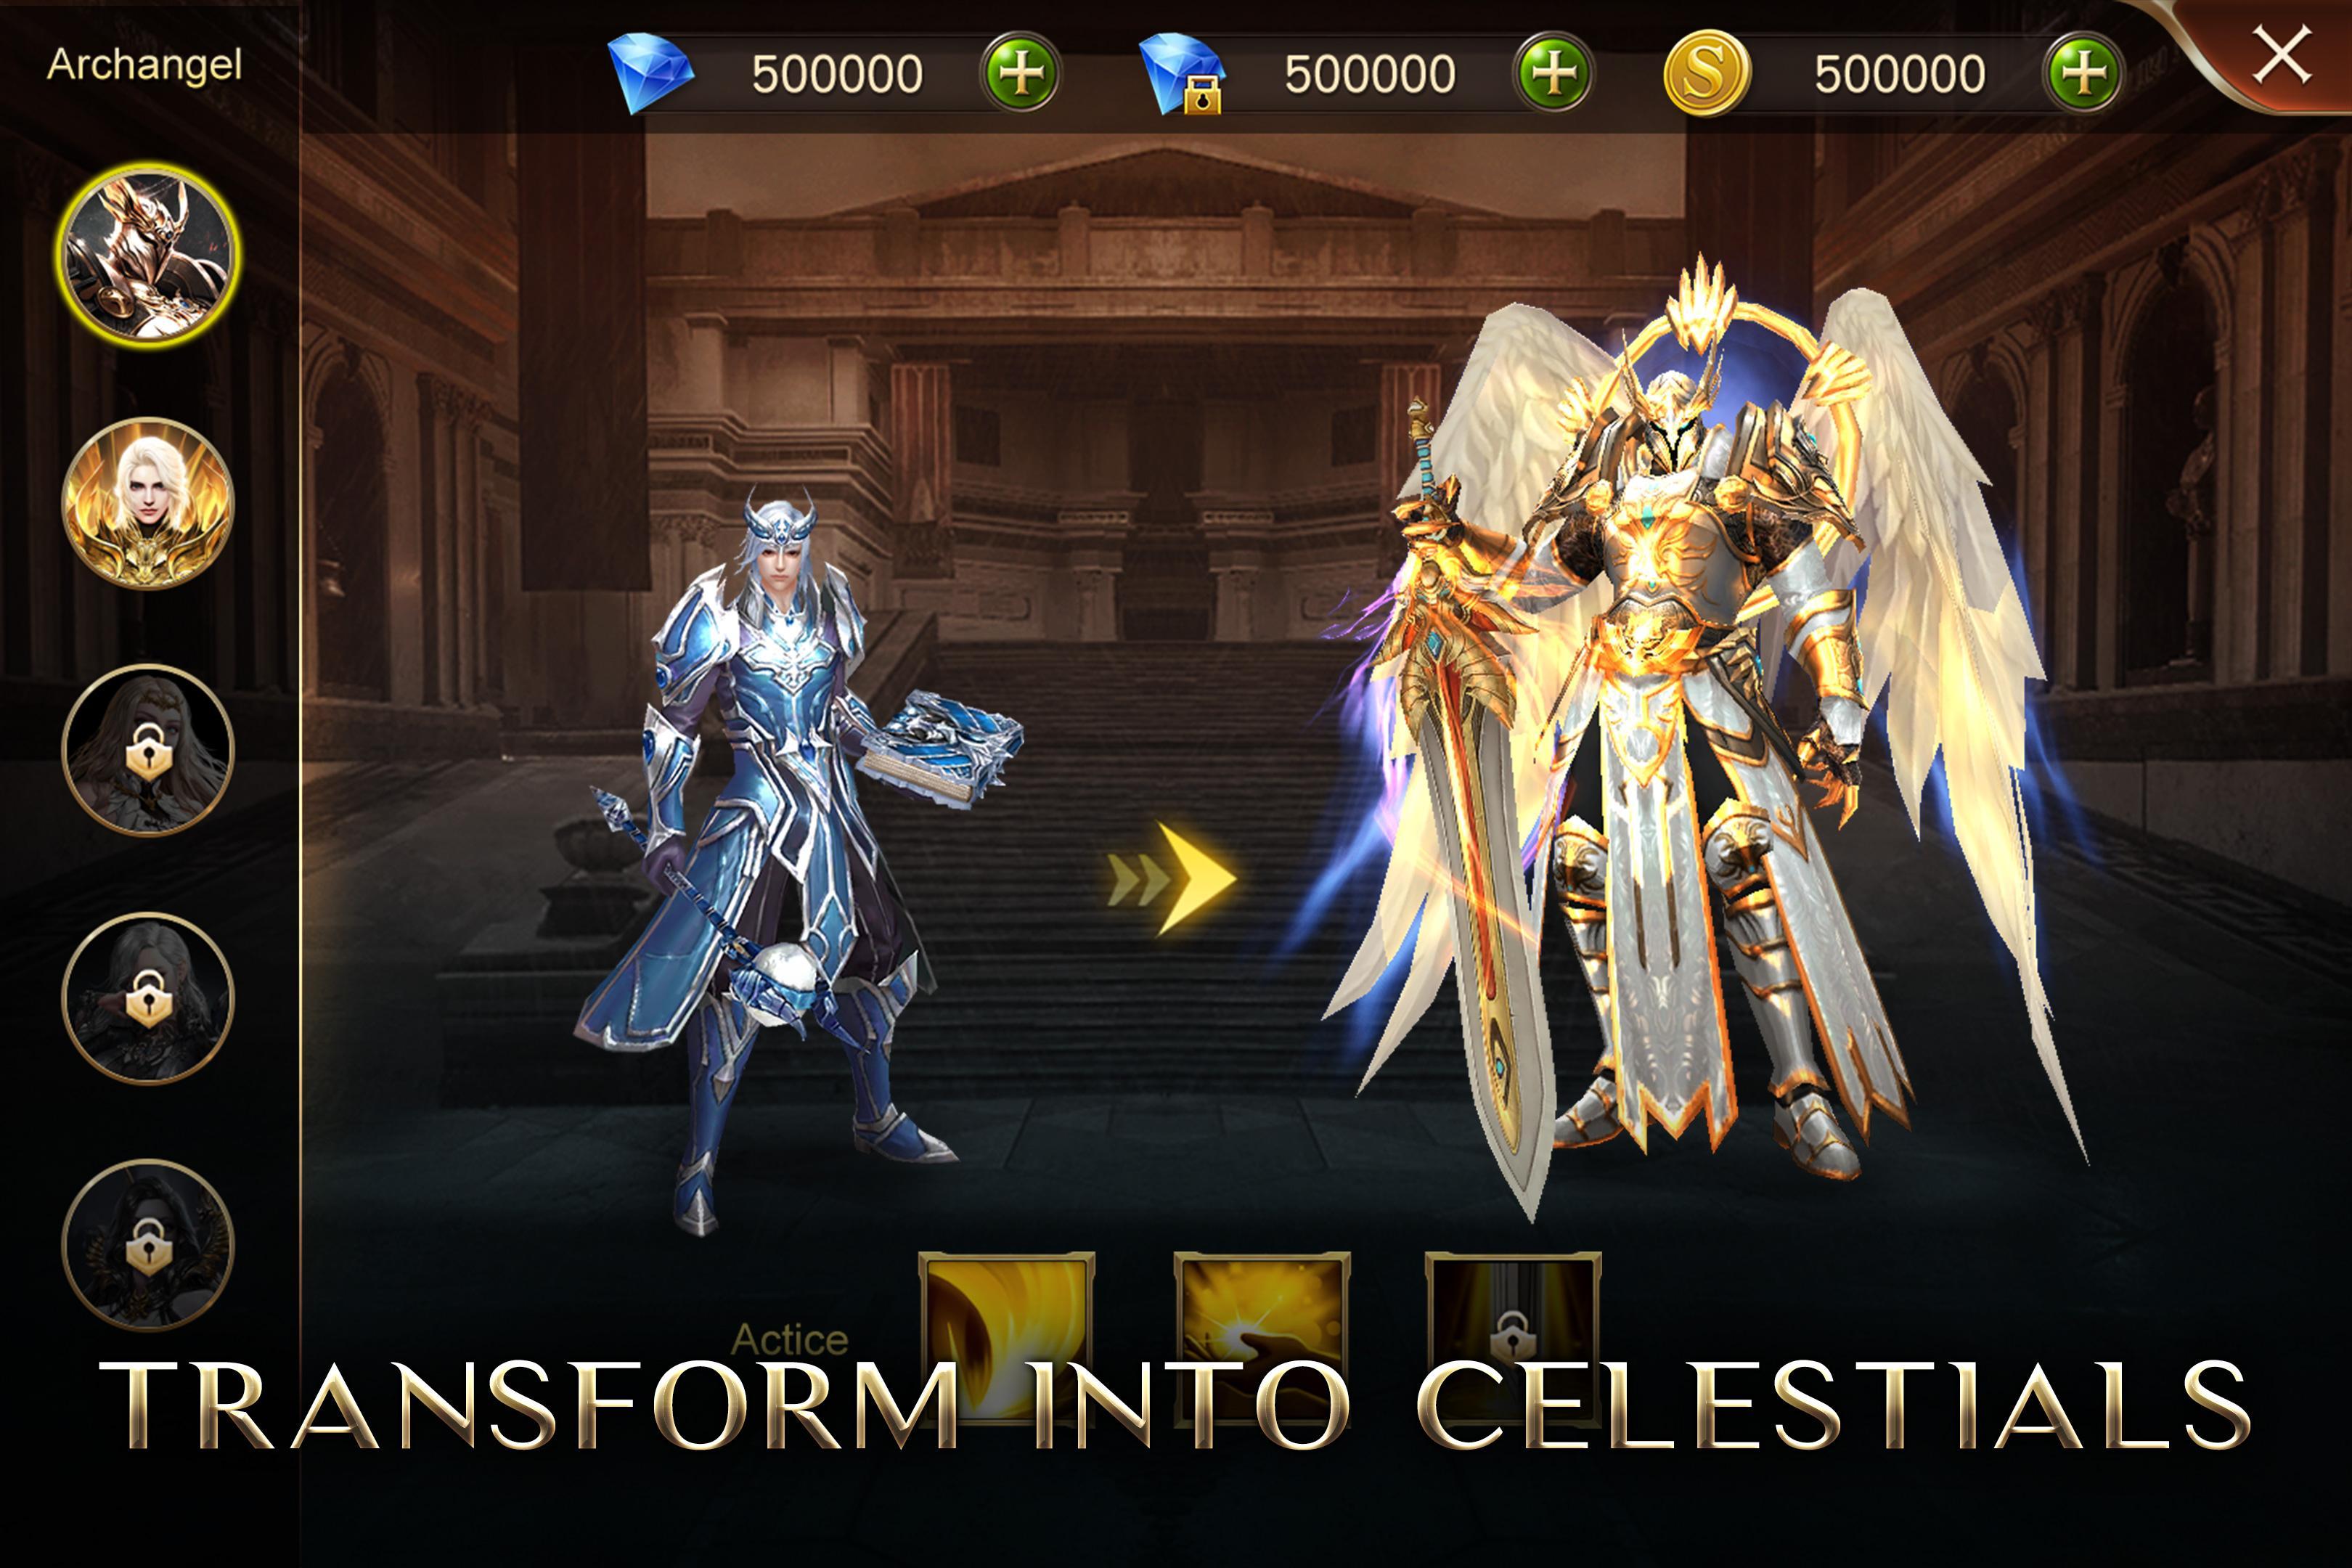 era of celestials pc download link